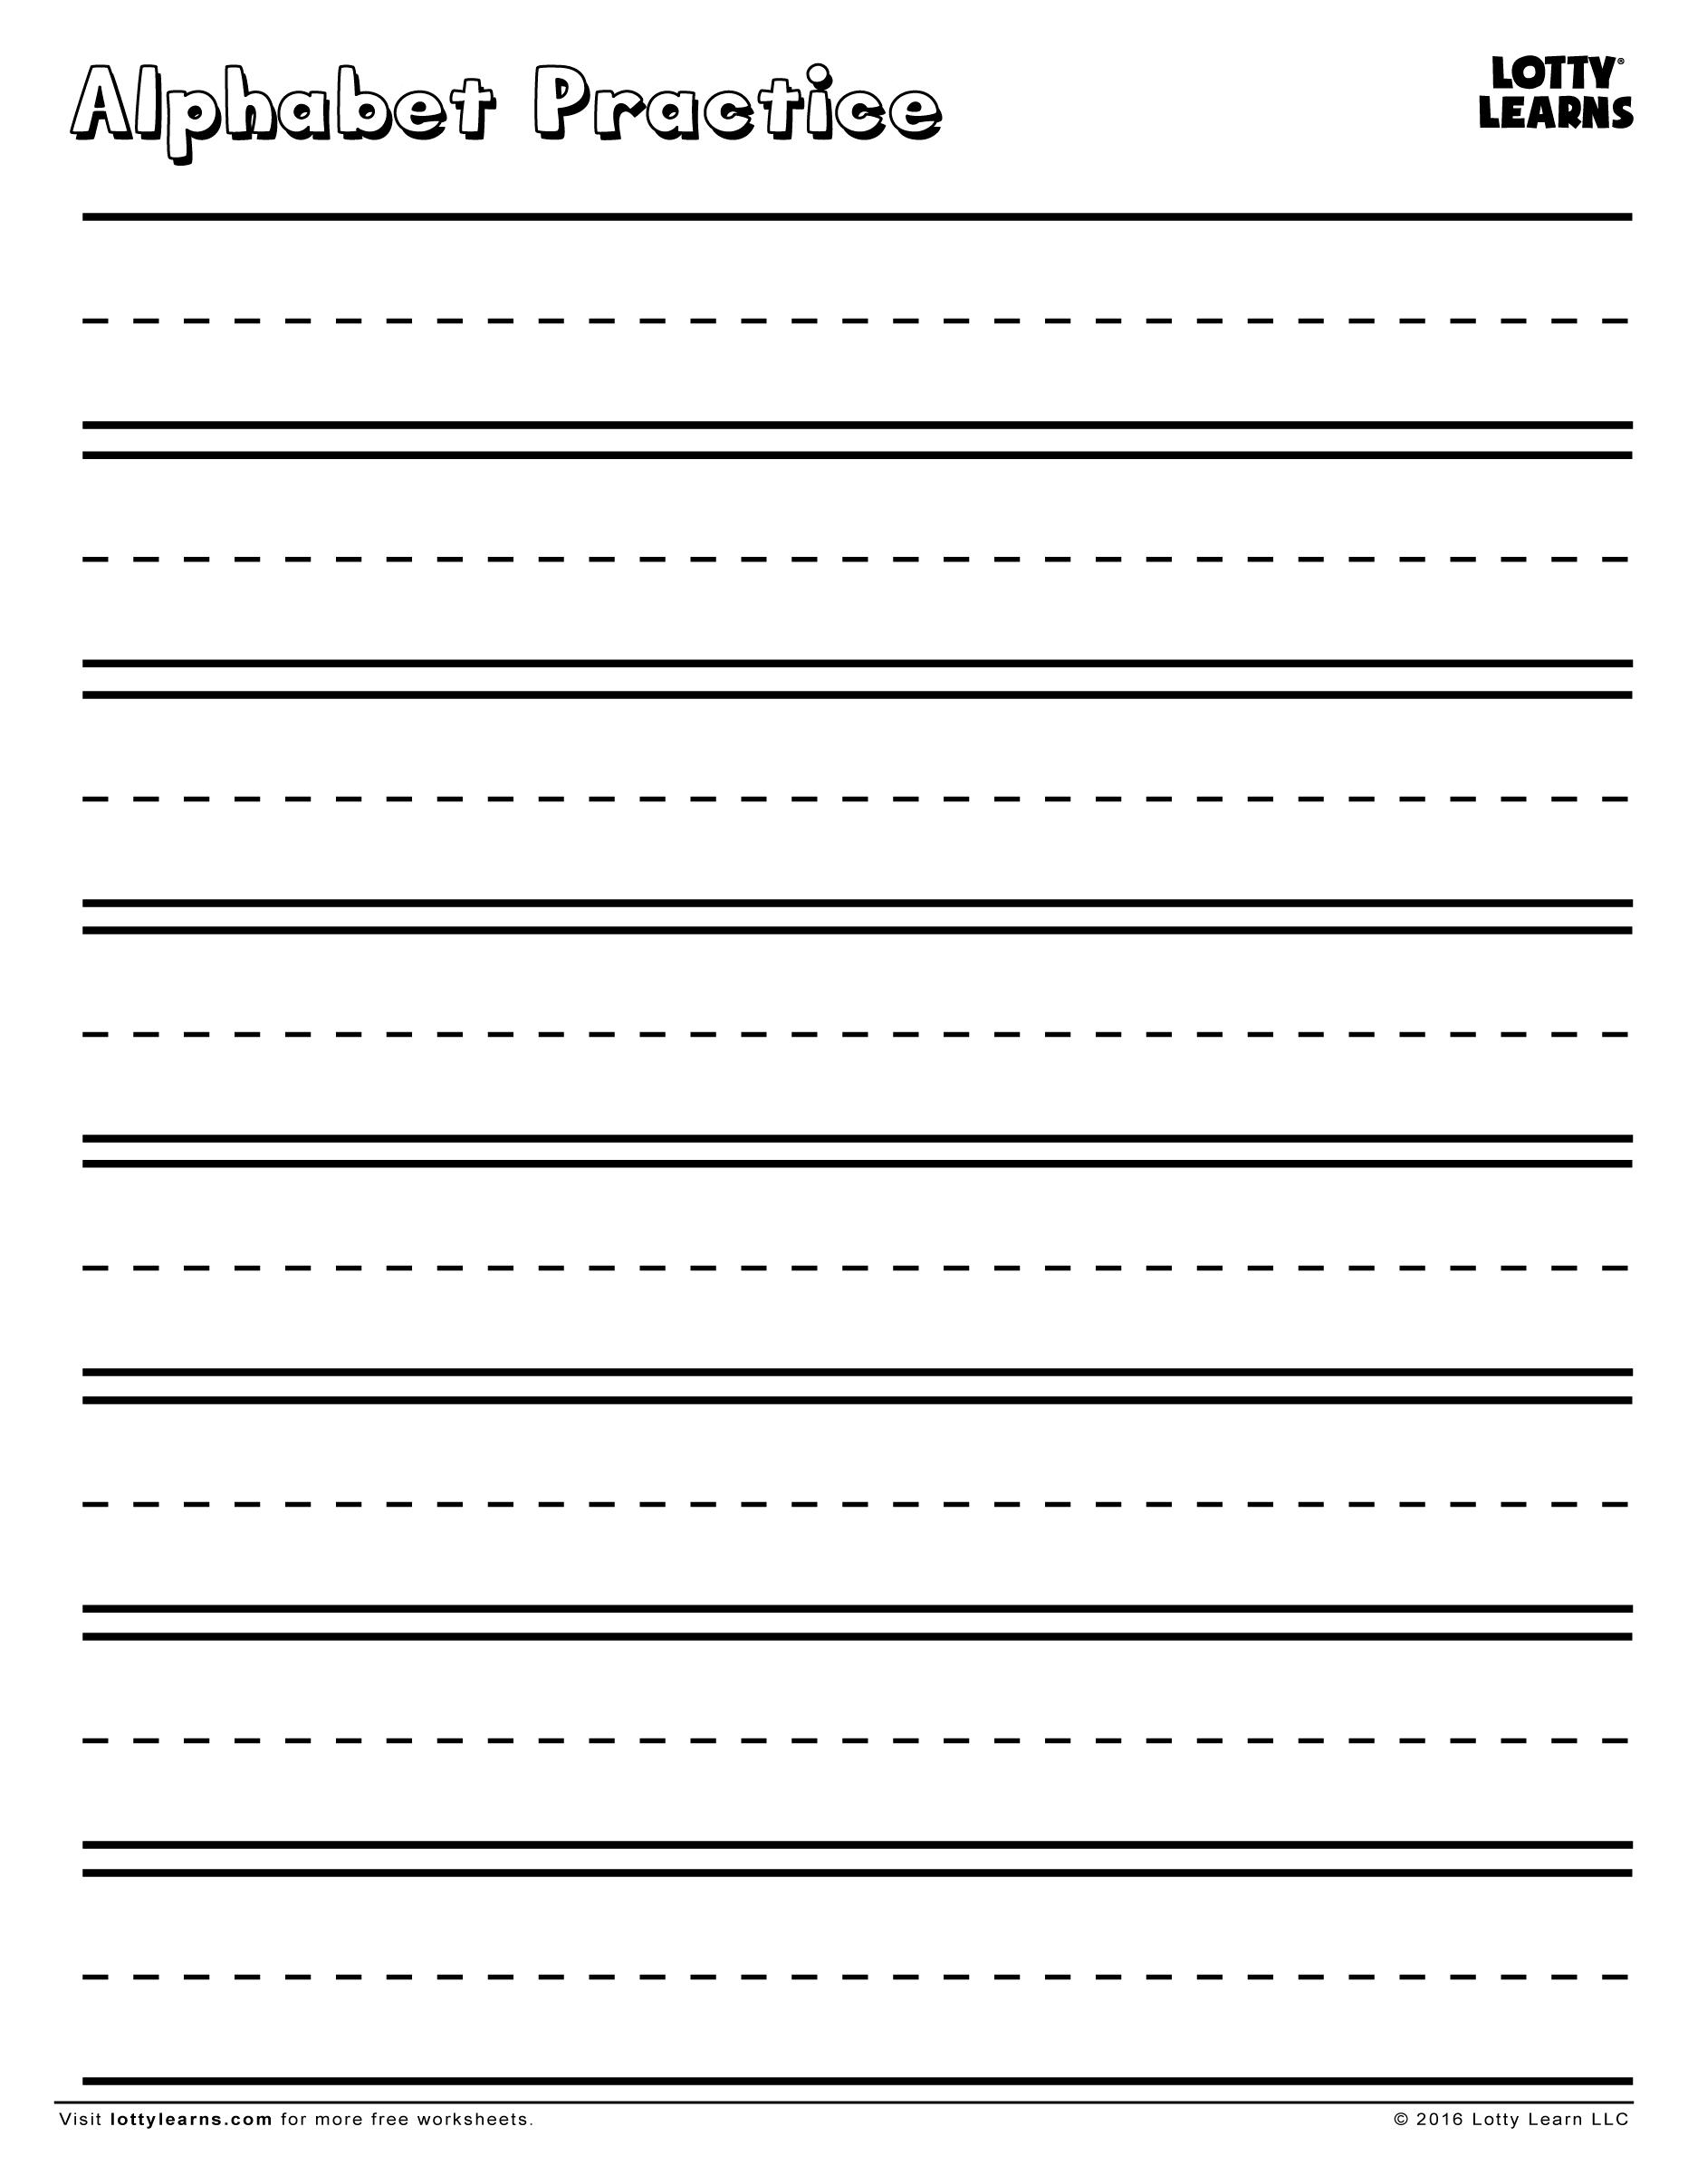 Alphabet Practice Sheet | Lotty Learns